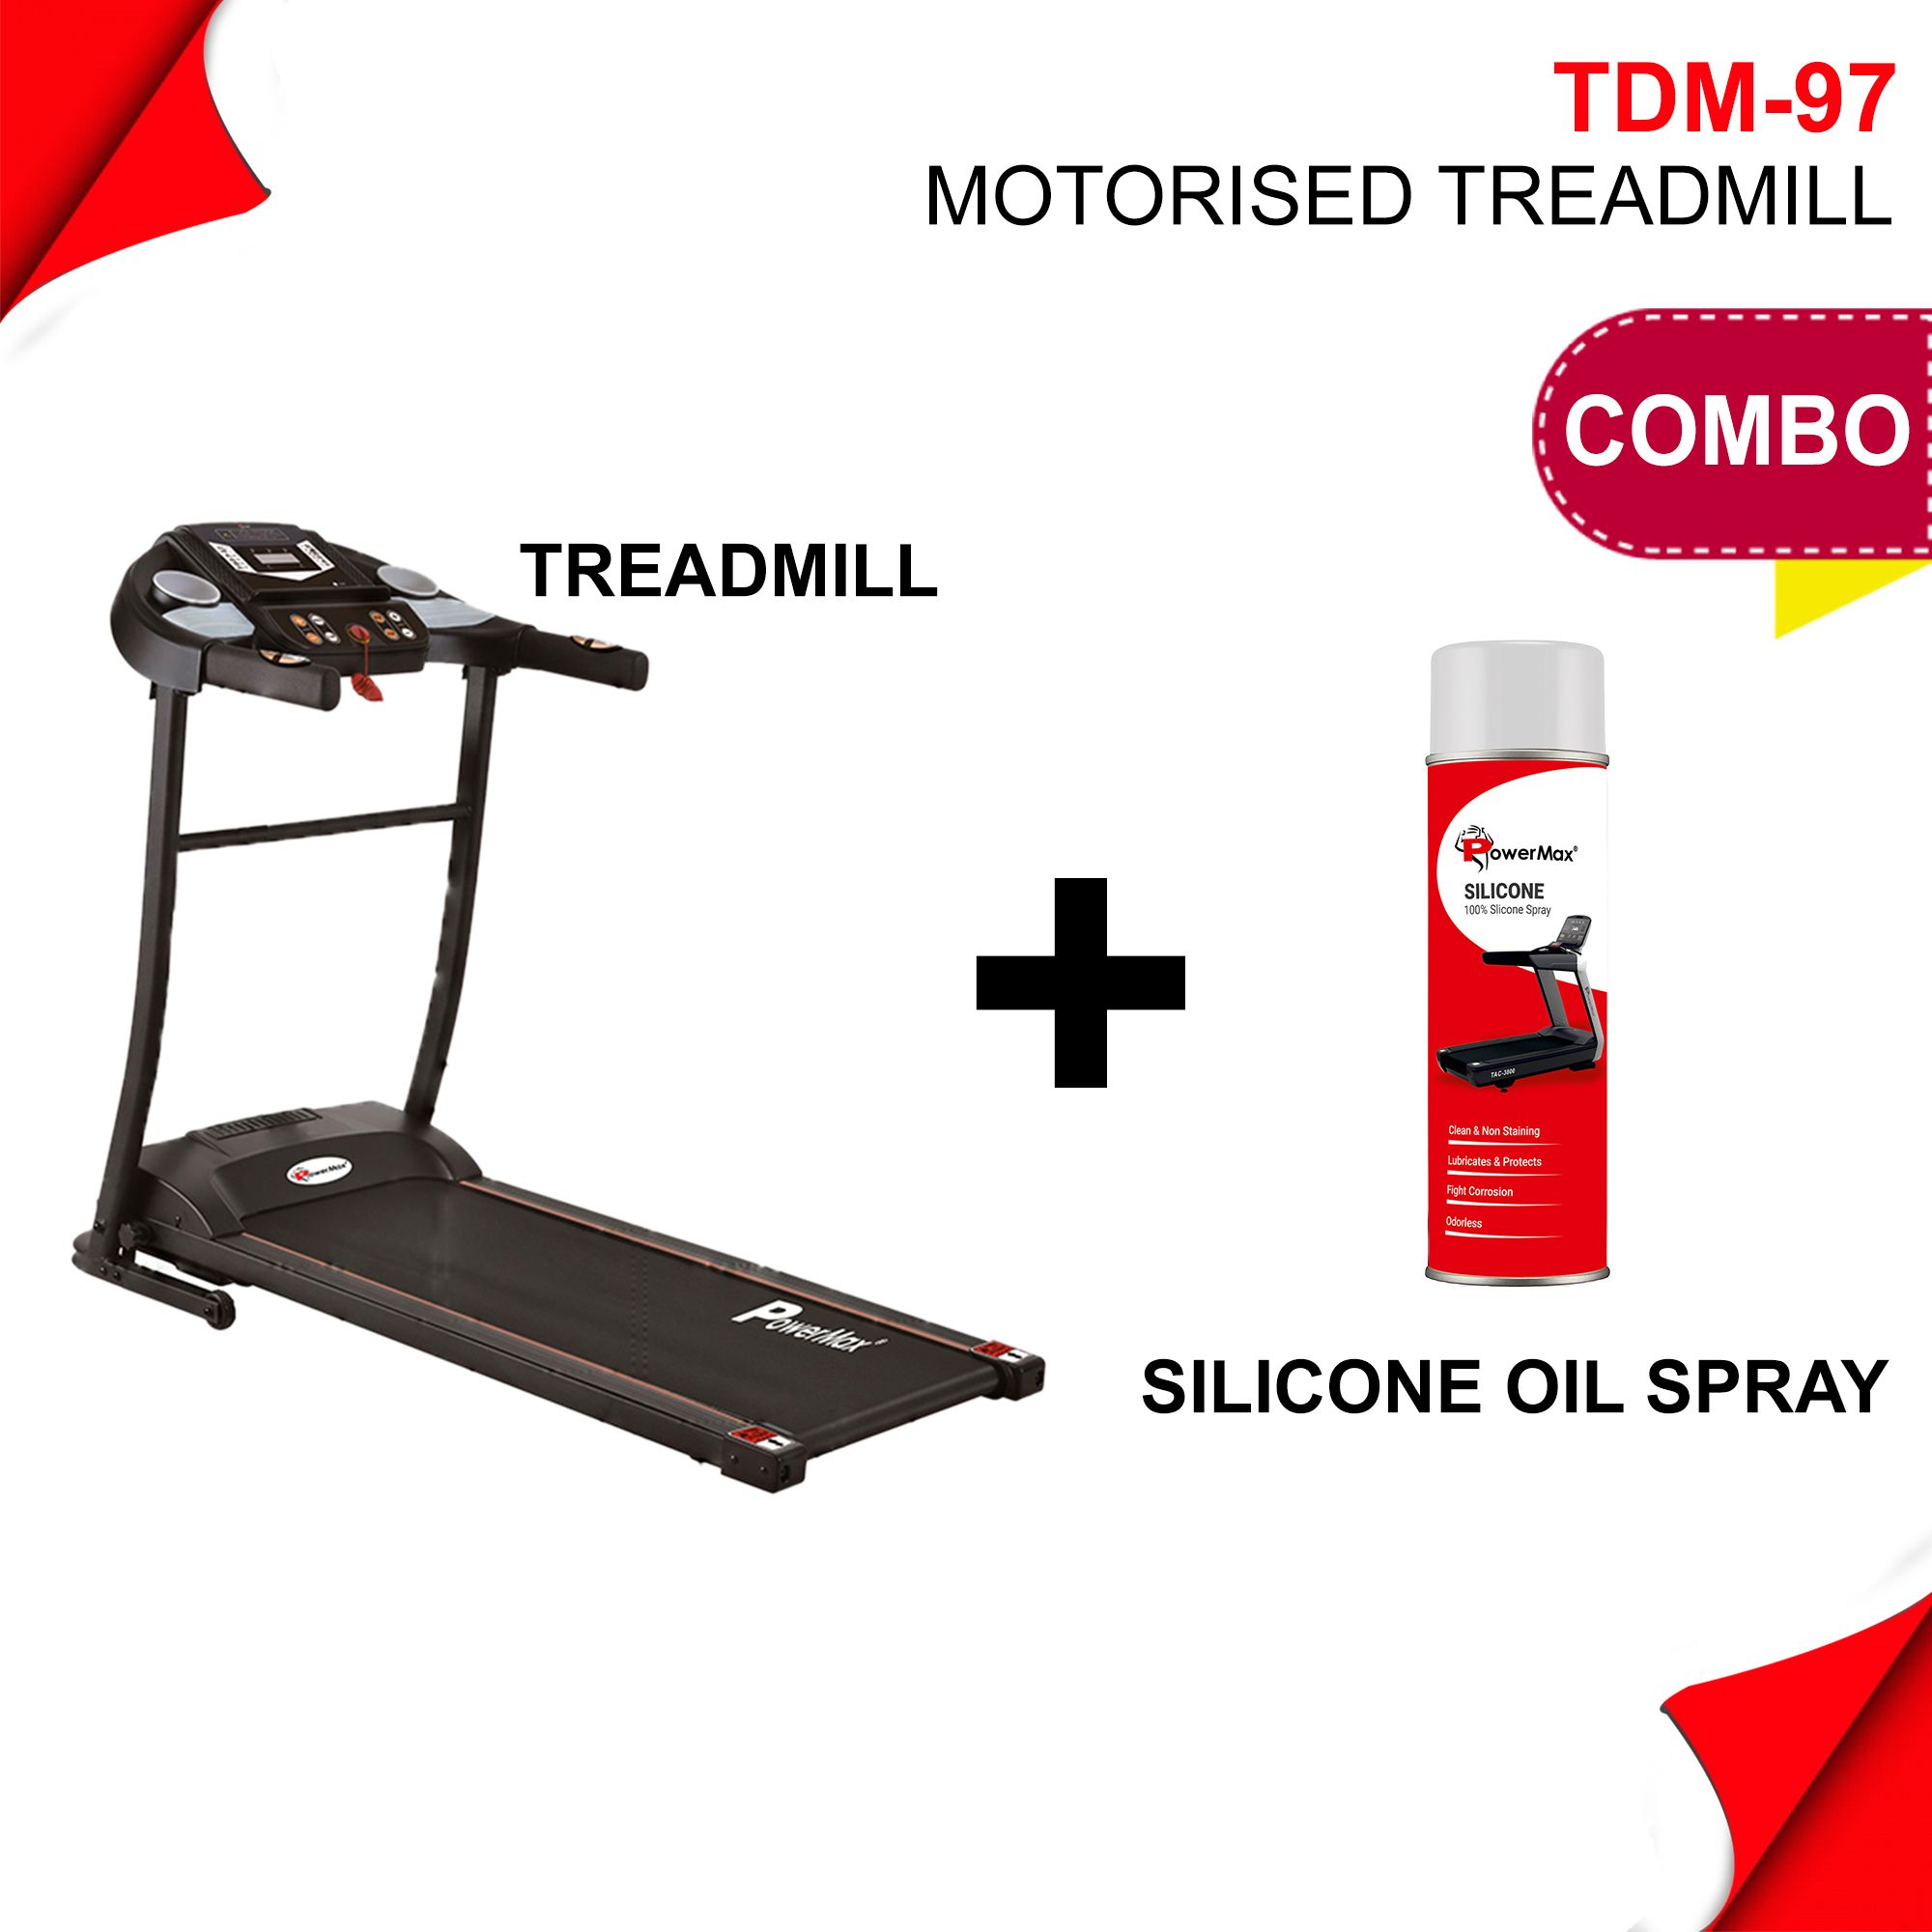 Amazon Spark Multi gym, Commercial treadmills, Folding